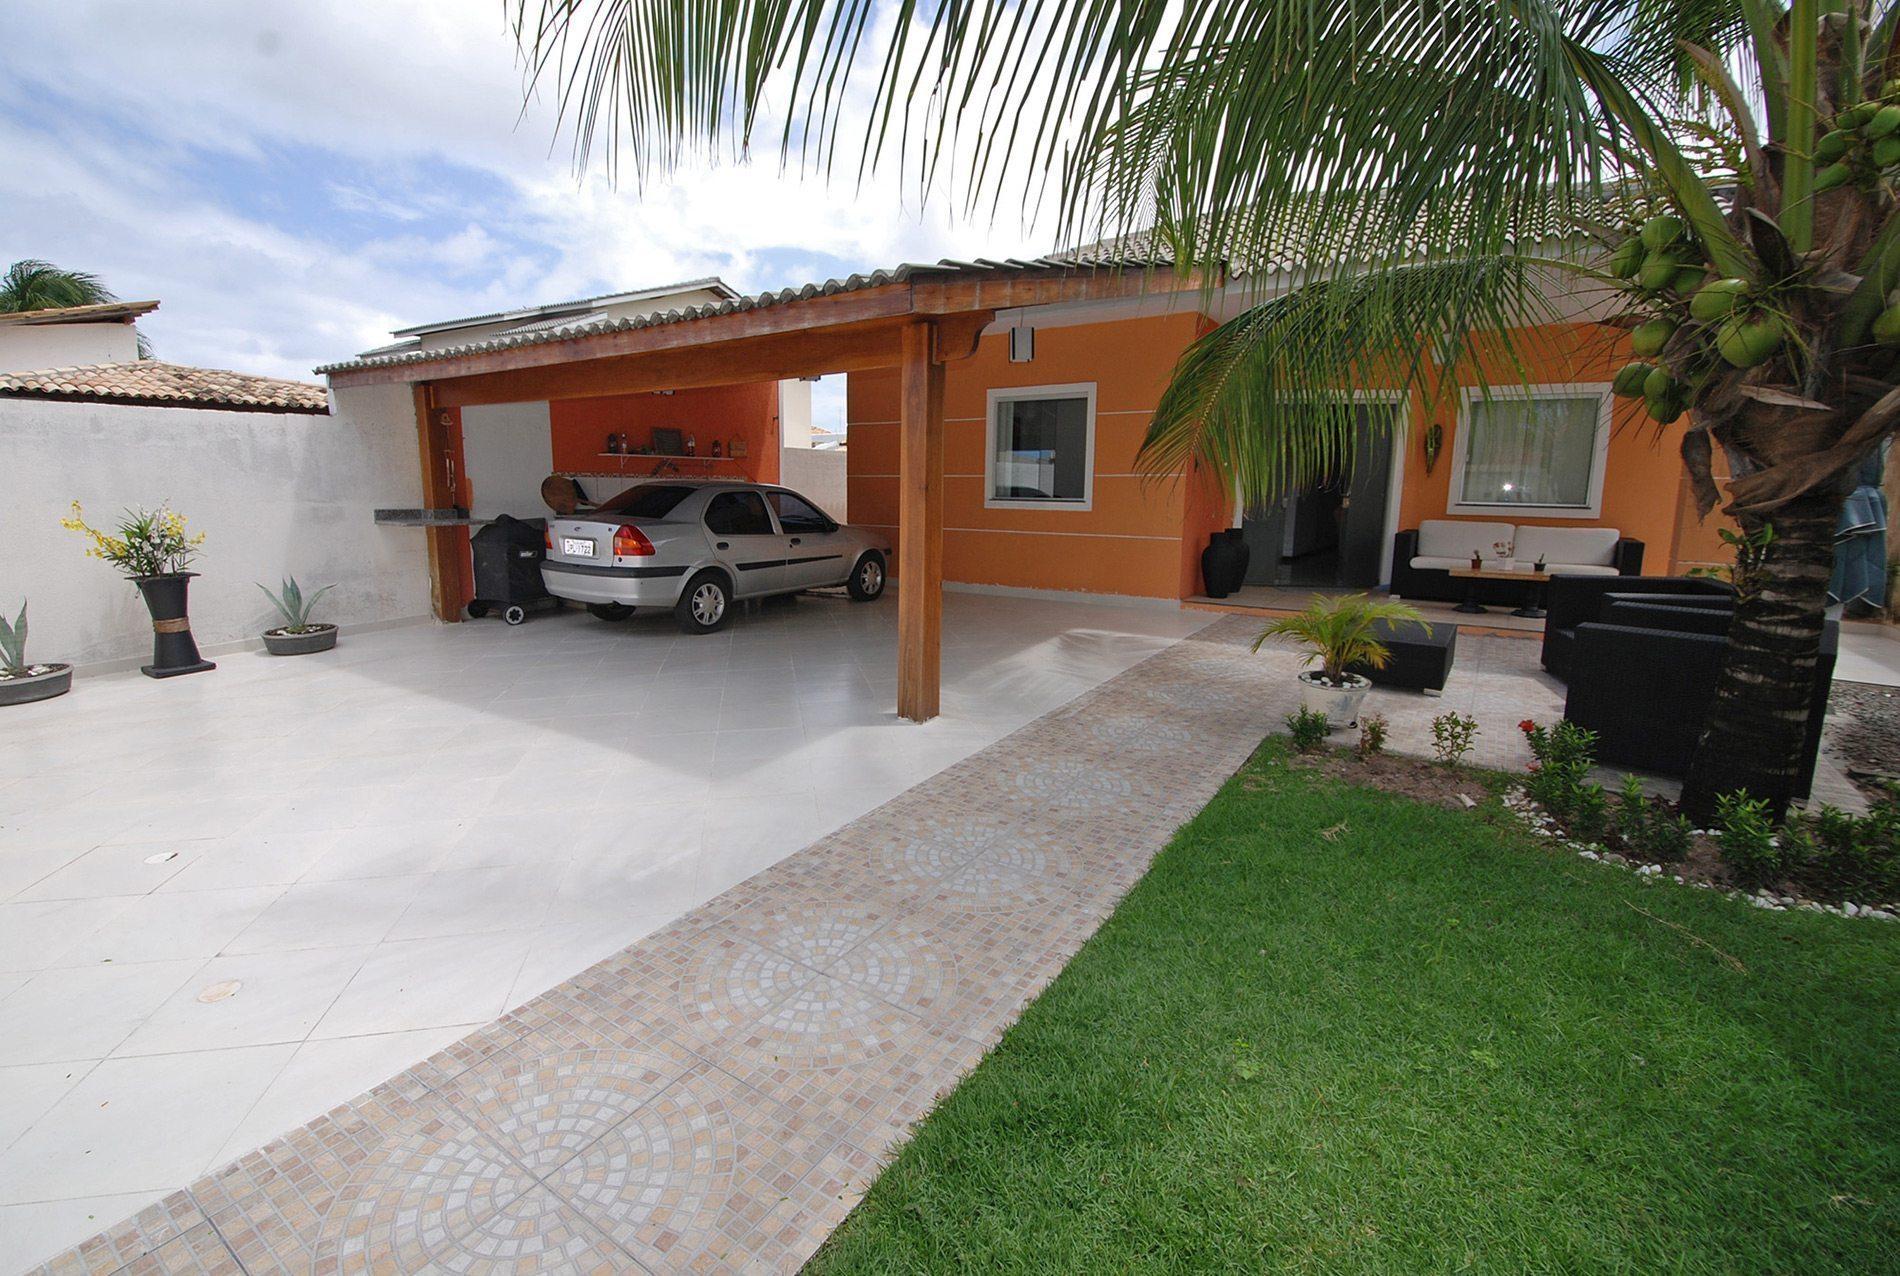 Charming house for sale near the beach in Ipitanga